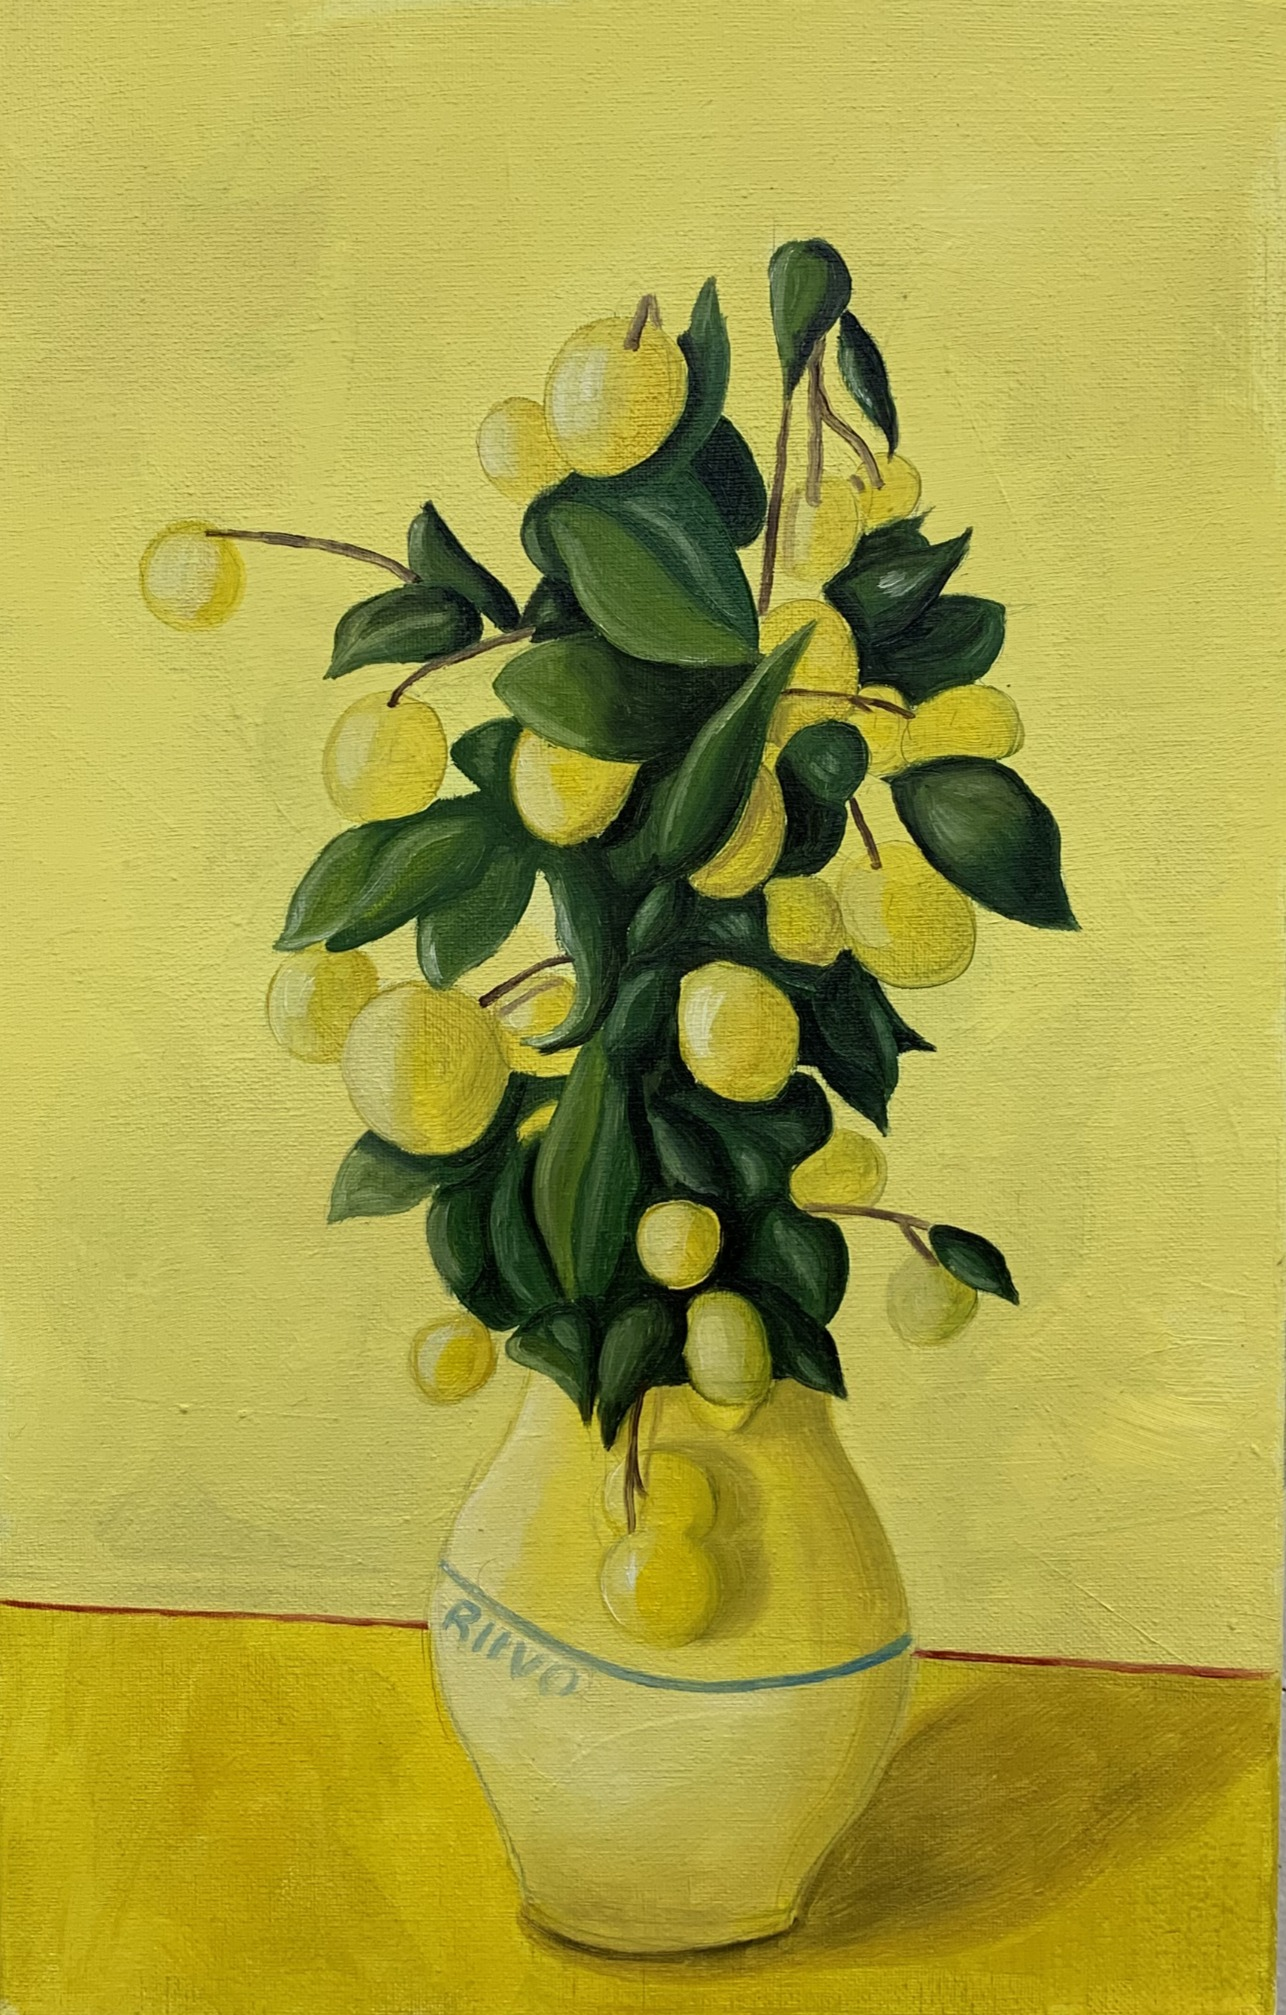 Riivo's Lemons